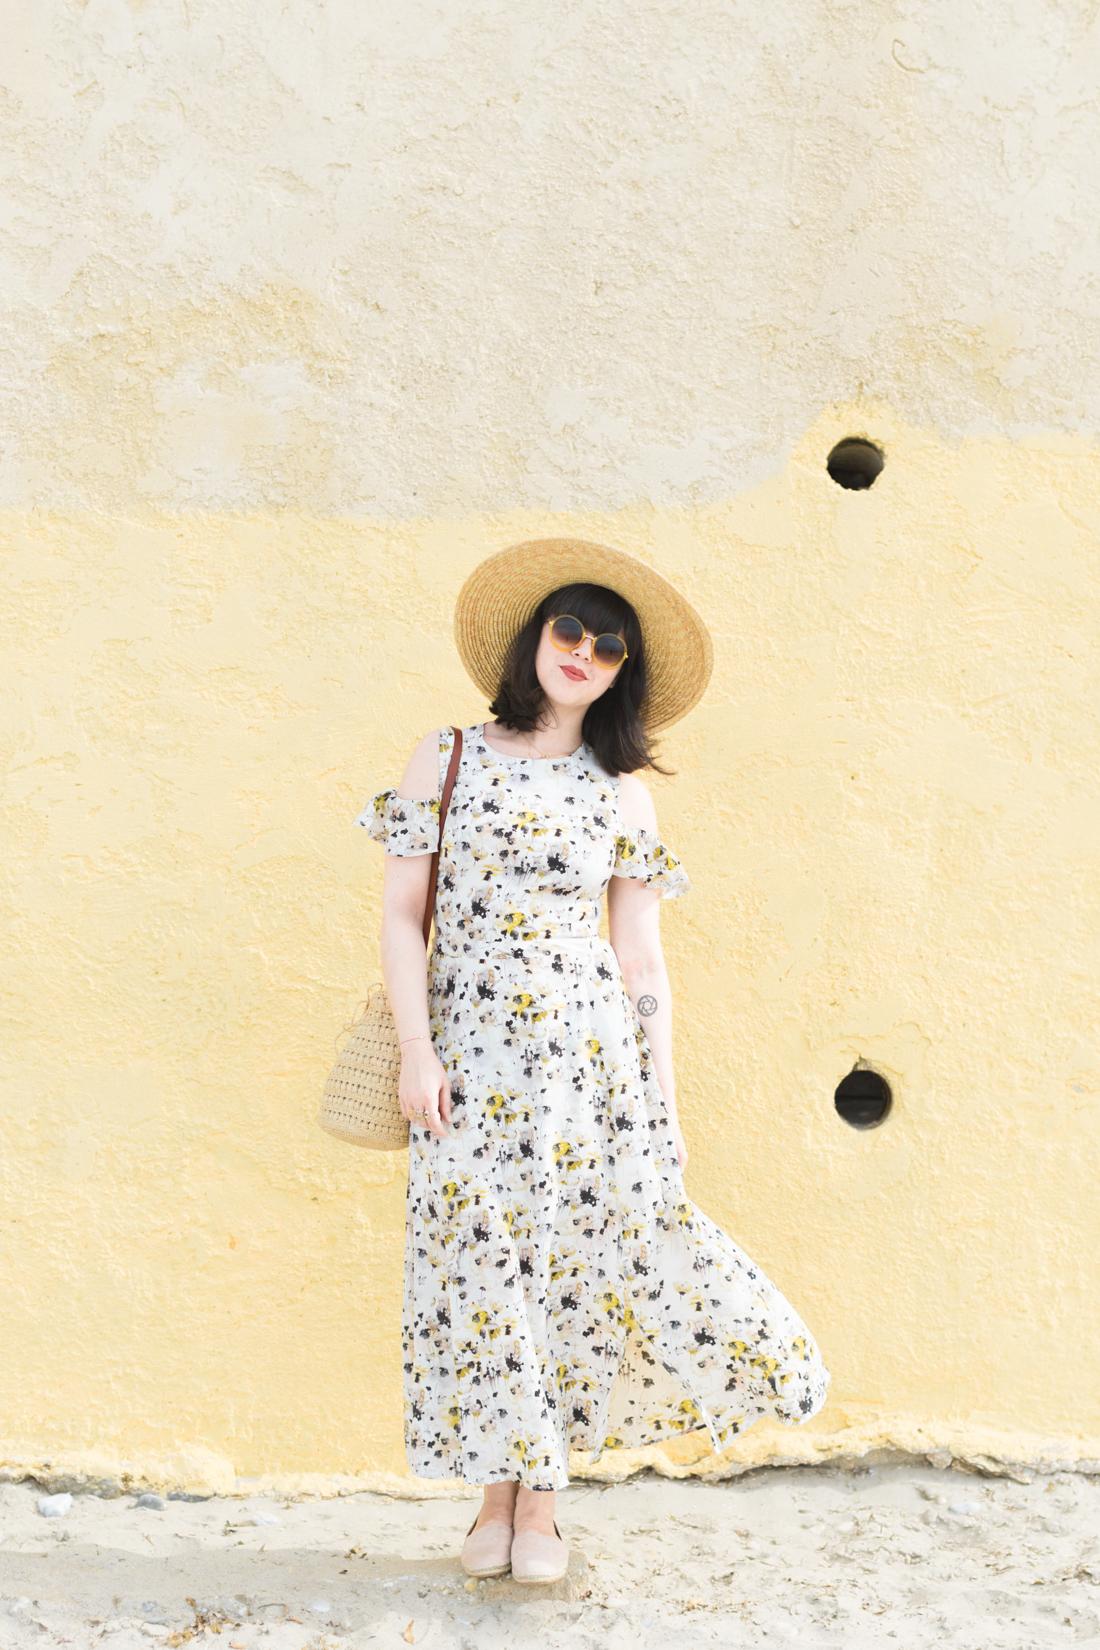 yellow_dress_flowers_kelly_love_youngbritishdesigners_copyright_Pauline_Privez_paulinefashionblog_com-1-2